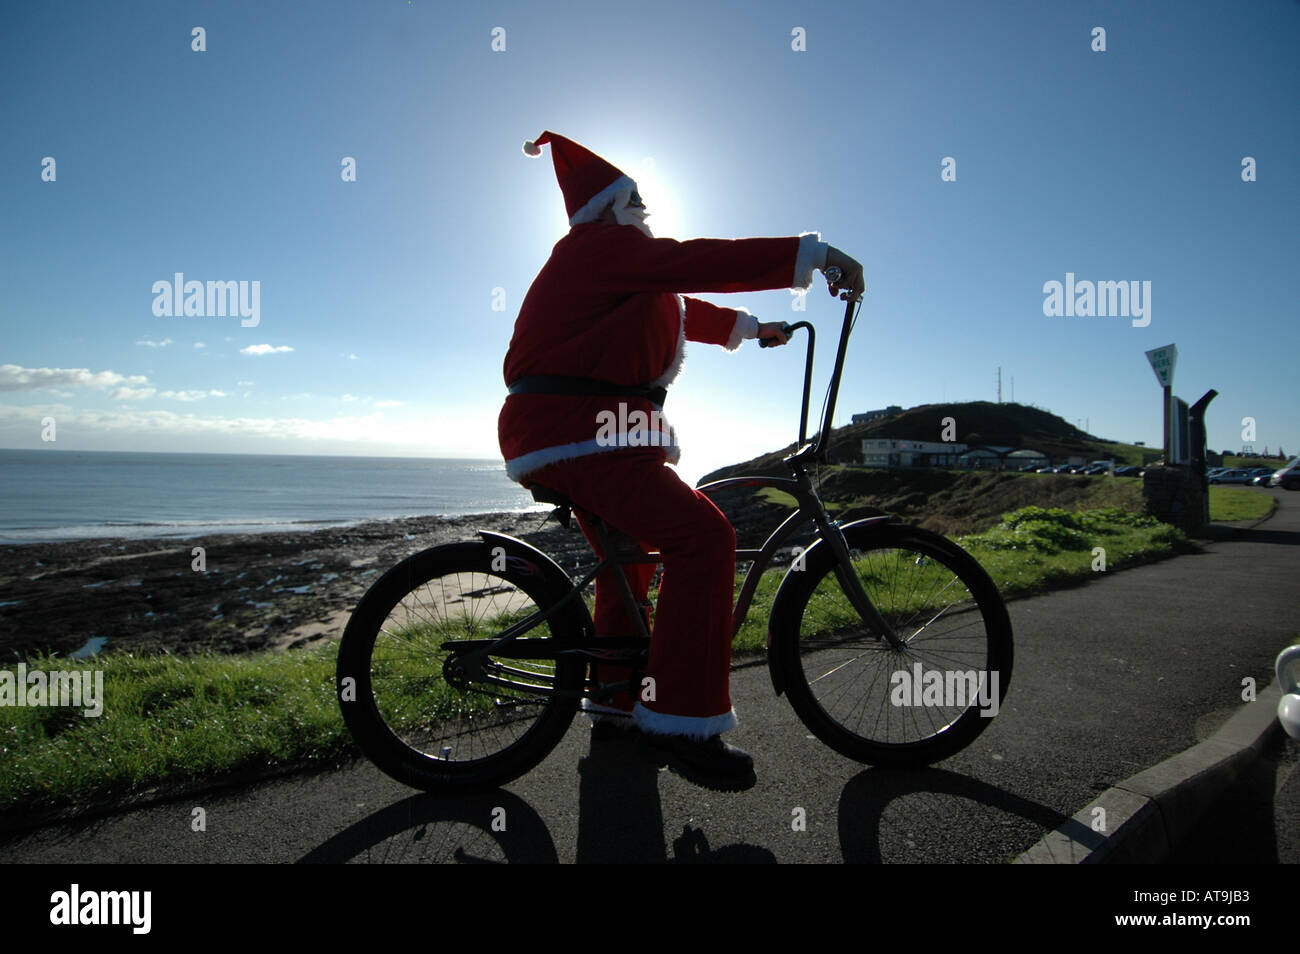 Santa On A Cruiser Bike At Limeslade Swansea Wales Uk Stock Photo Alamy